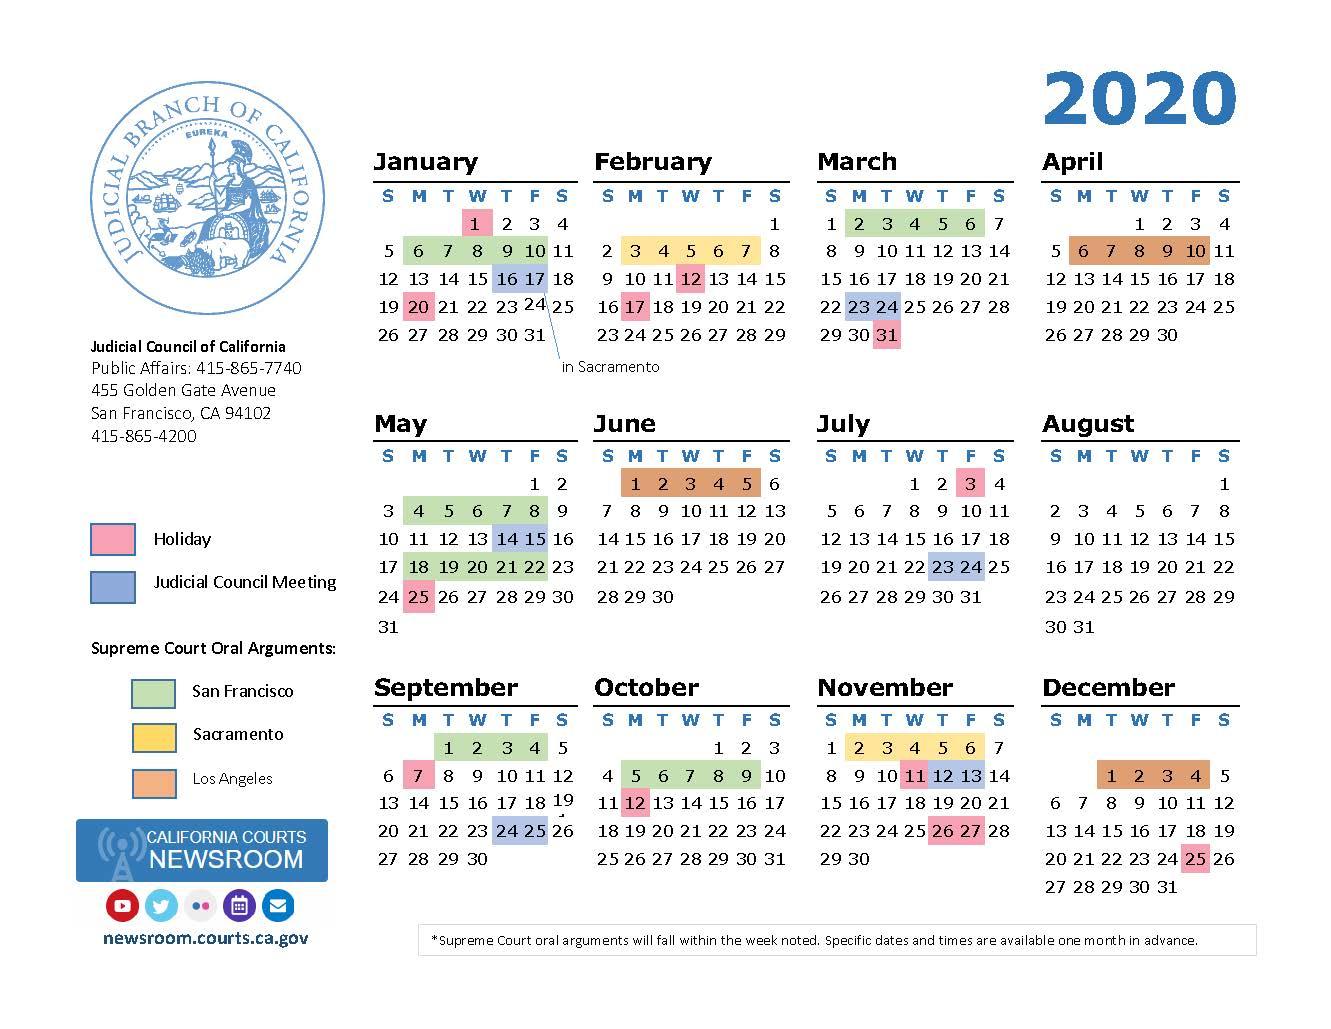 2020 California Courts Calendar | California Courts Newsroom throughout Los Angeles Suprior Court Calendar